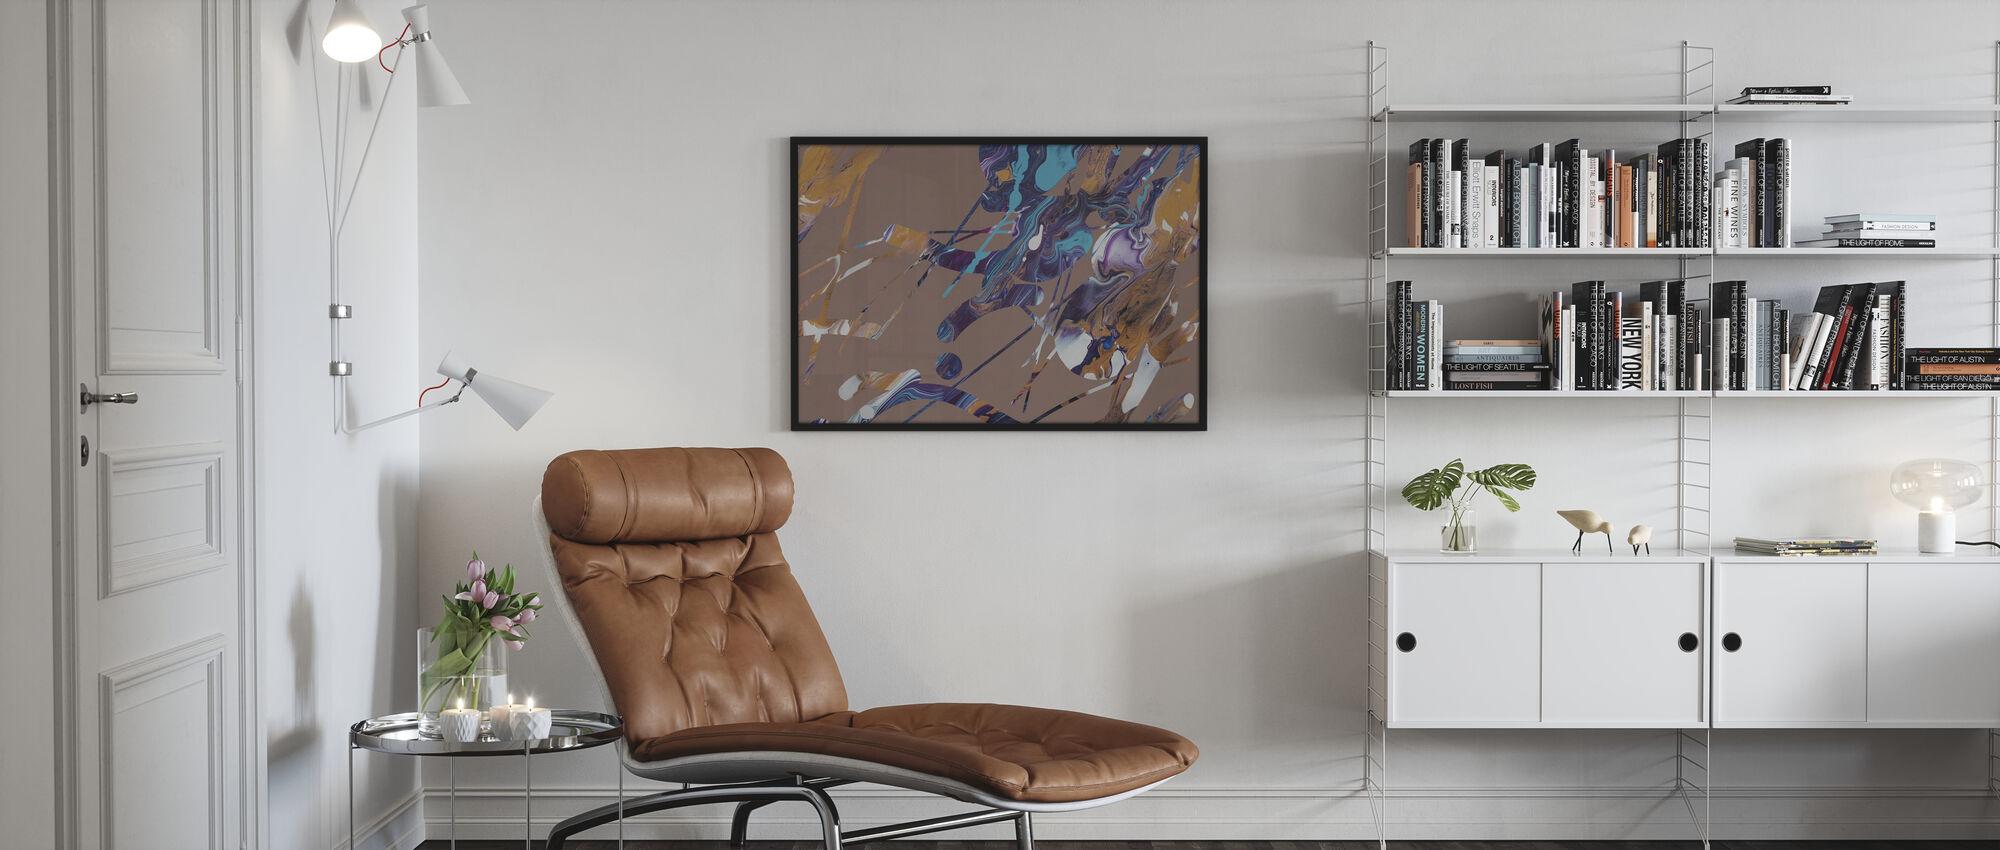 Acrylic Passion - Hazel - Poster - Living Room